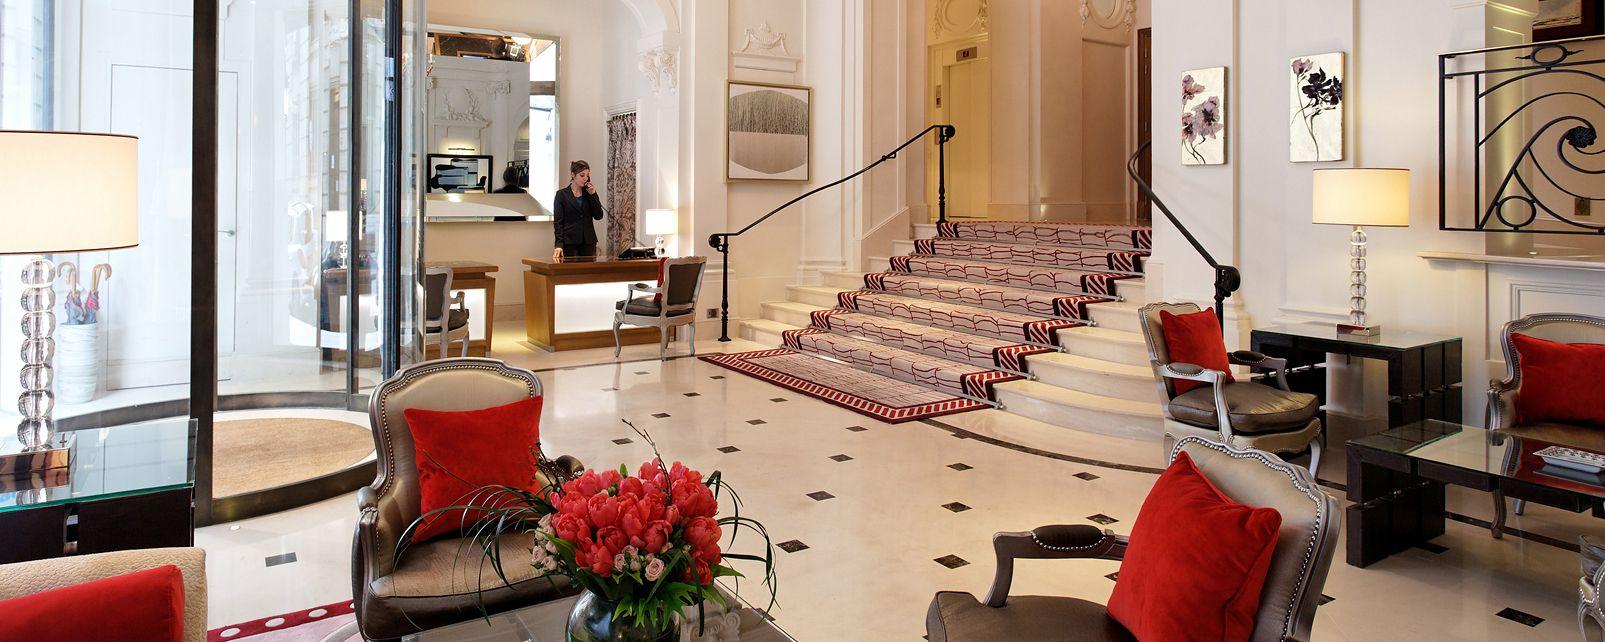 Hotel Majestic Hotel